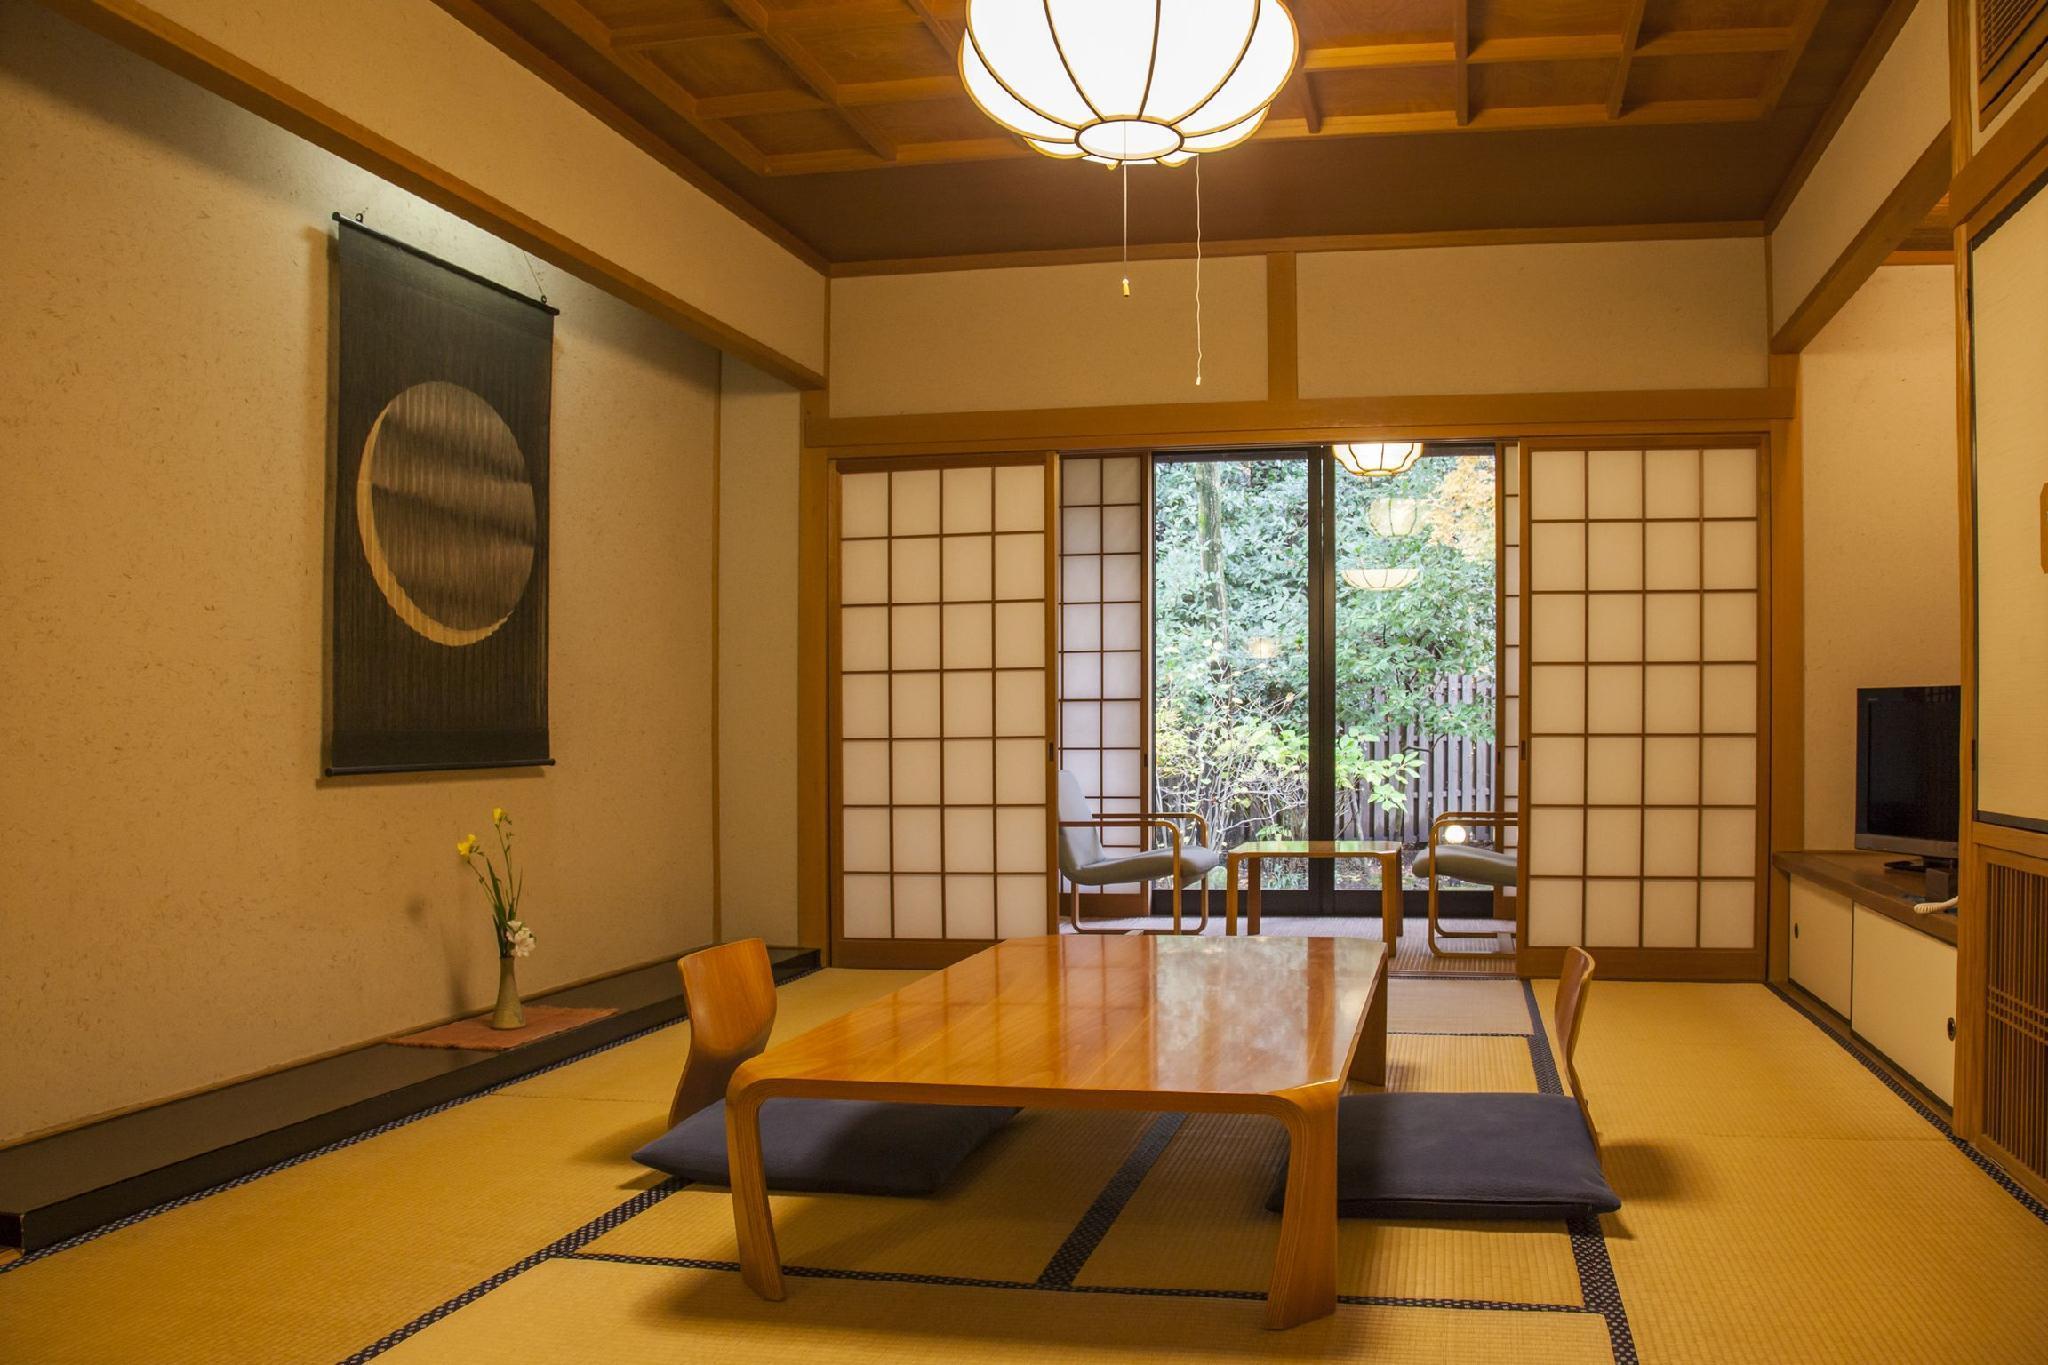 Yufuin onsen ryokan hananomai in japan room deals - Ryokan tokyo with private bathroom ...